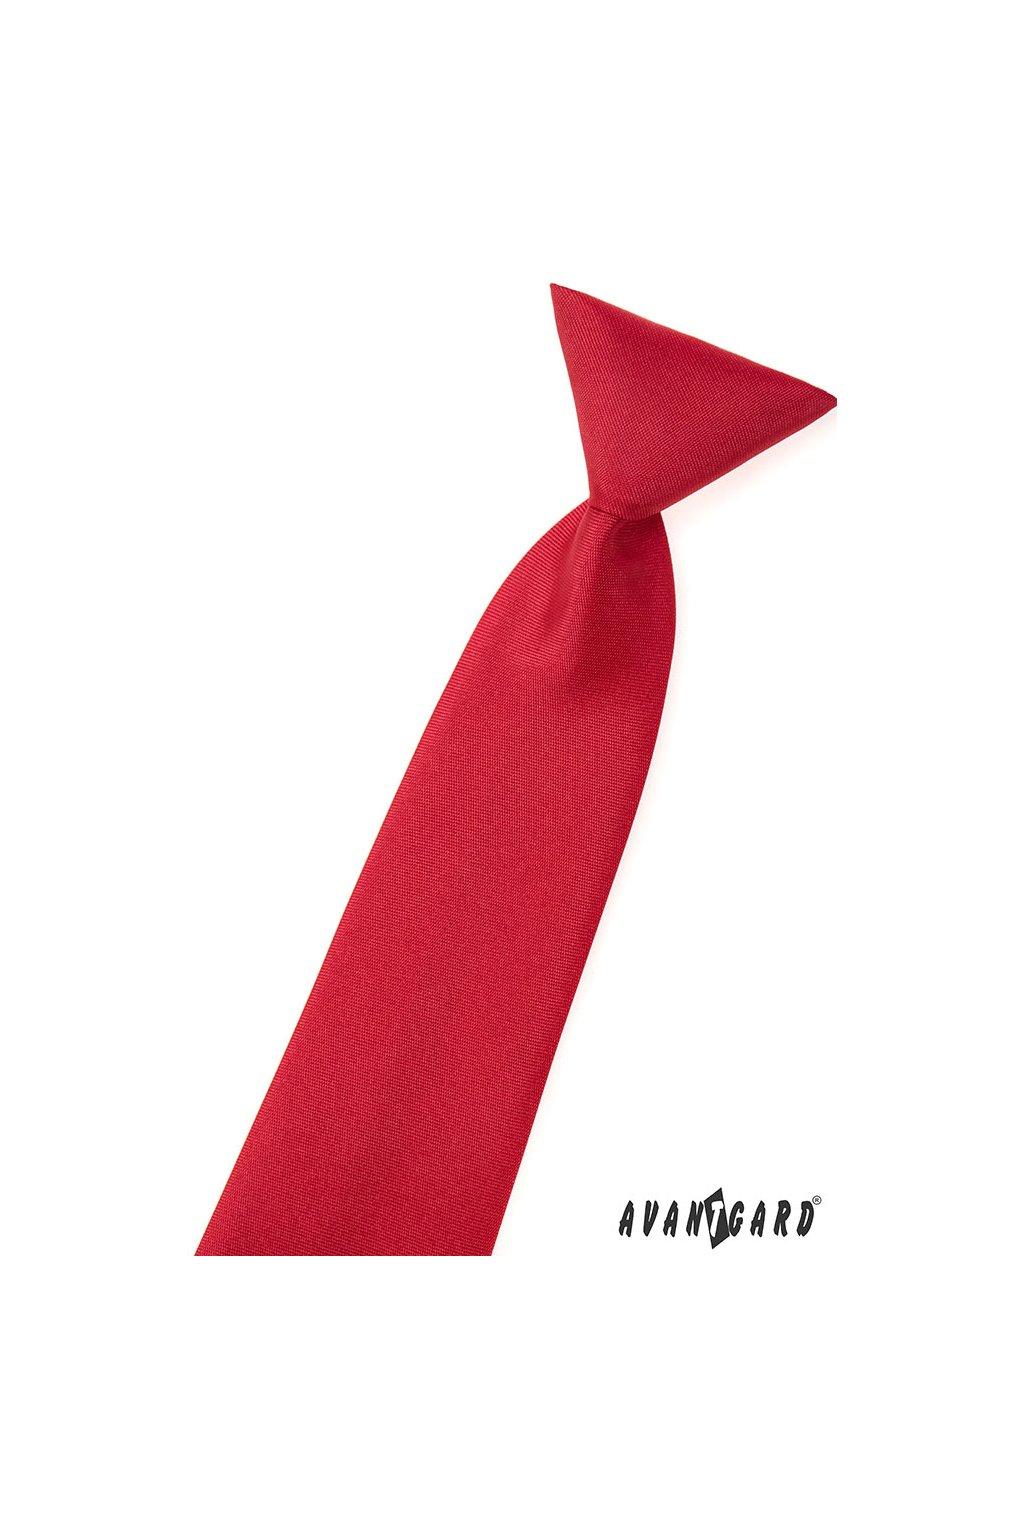 Chlapecká kravata, 558-7058, Červená MAT